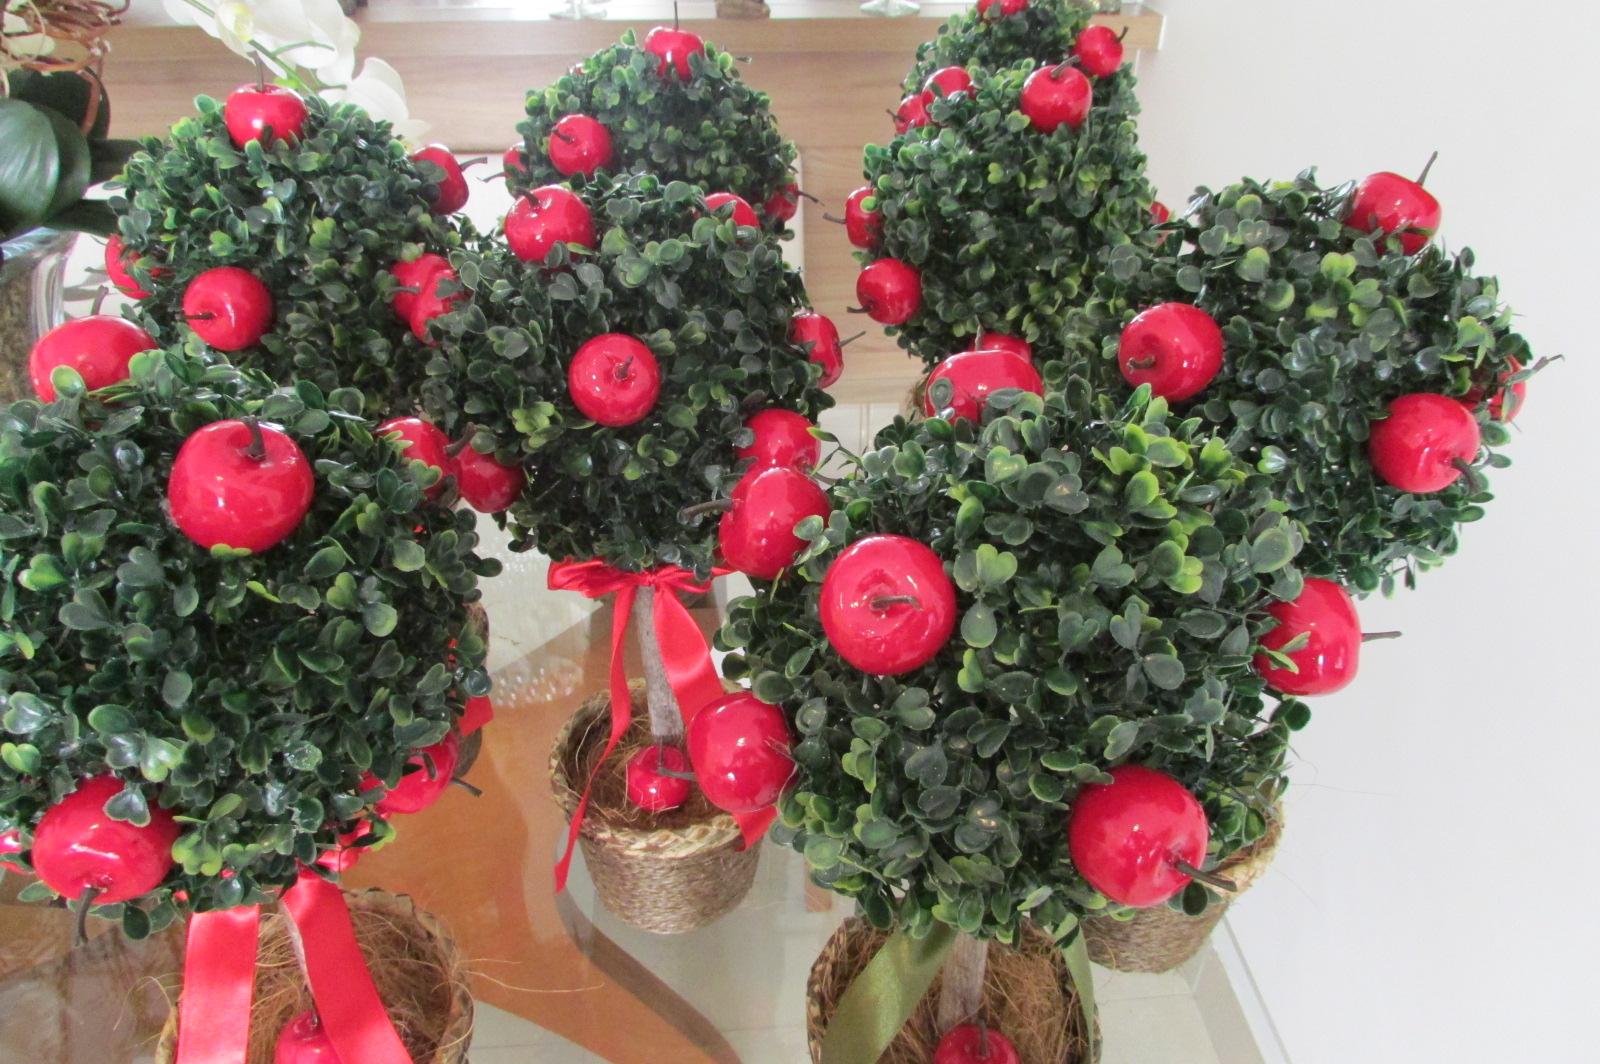 enfeites para jardim branca de neve:topiara-de-buchinho-vaso-rustico-decoracao-branca-de-neve